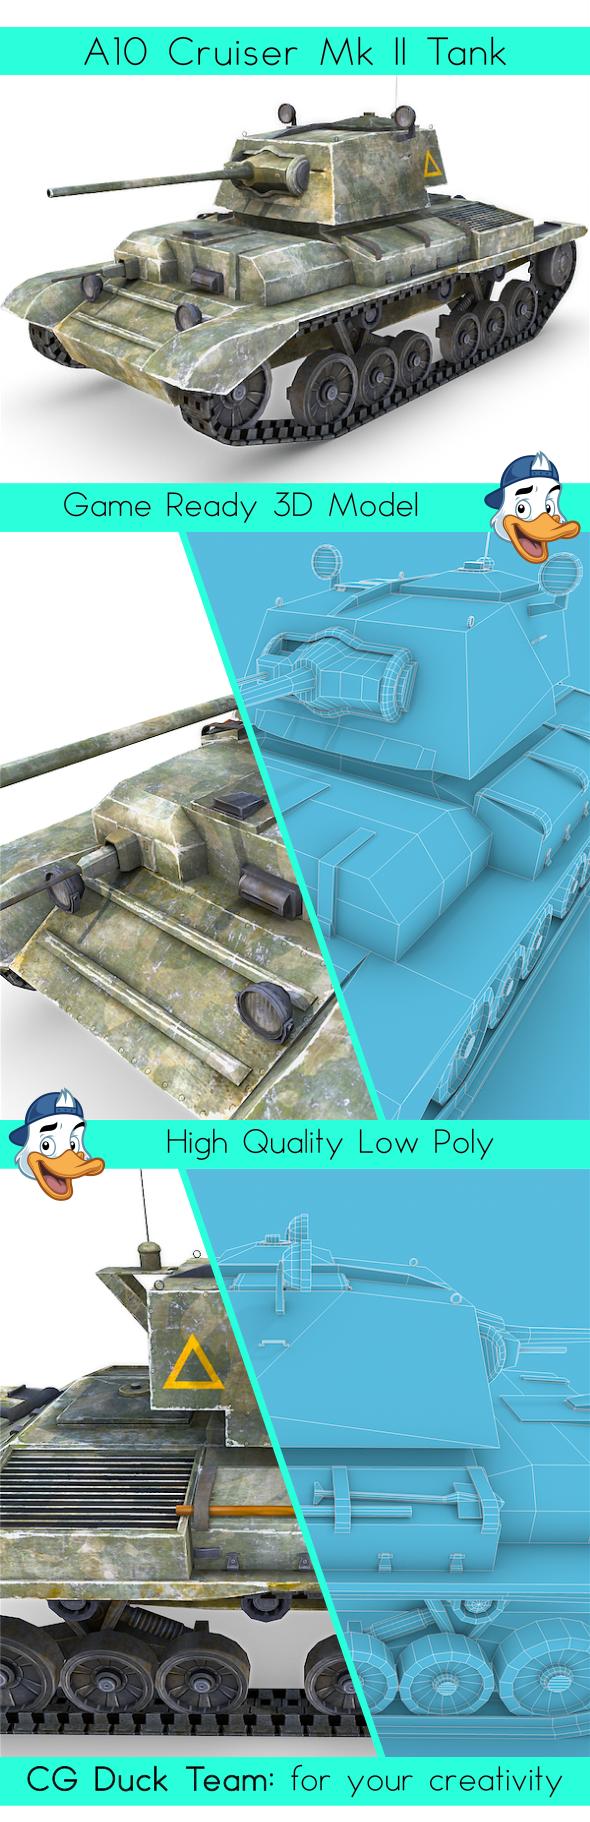 A10 Cruiser Mk II Tank - 3DOcean Item for Sale